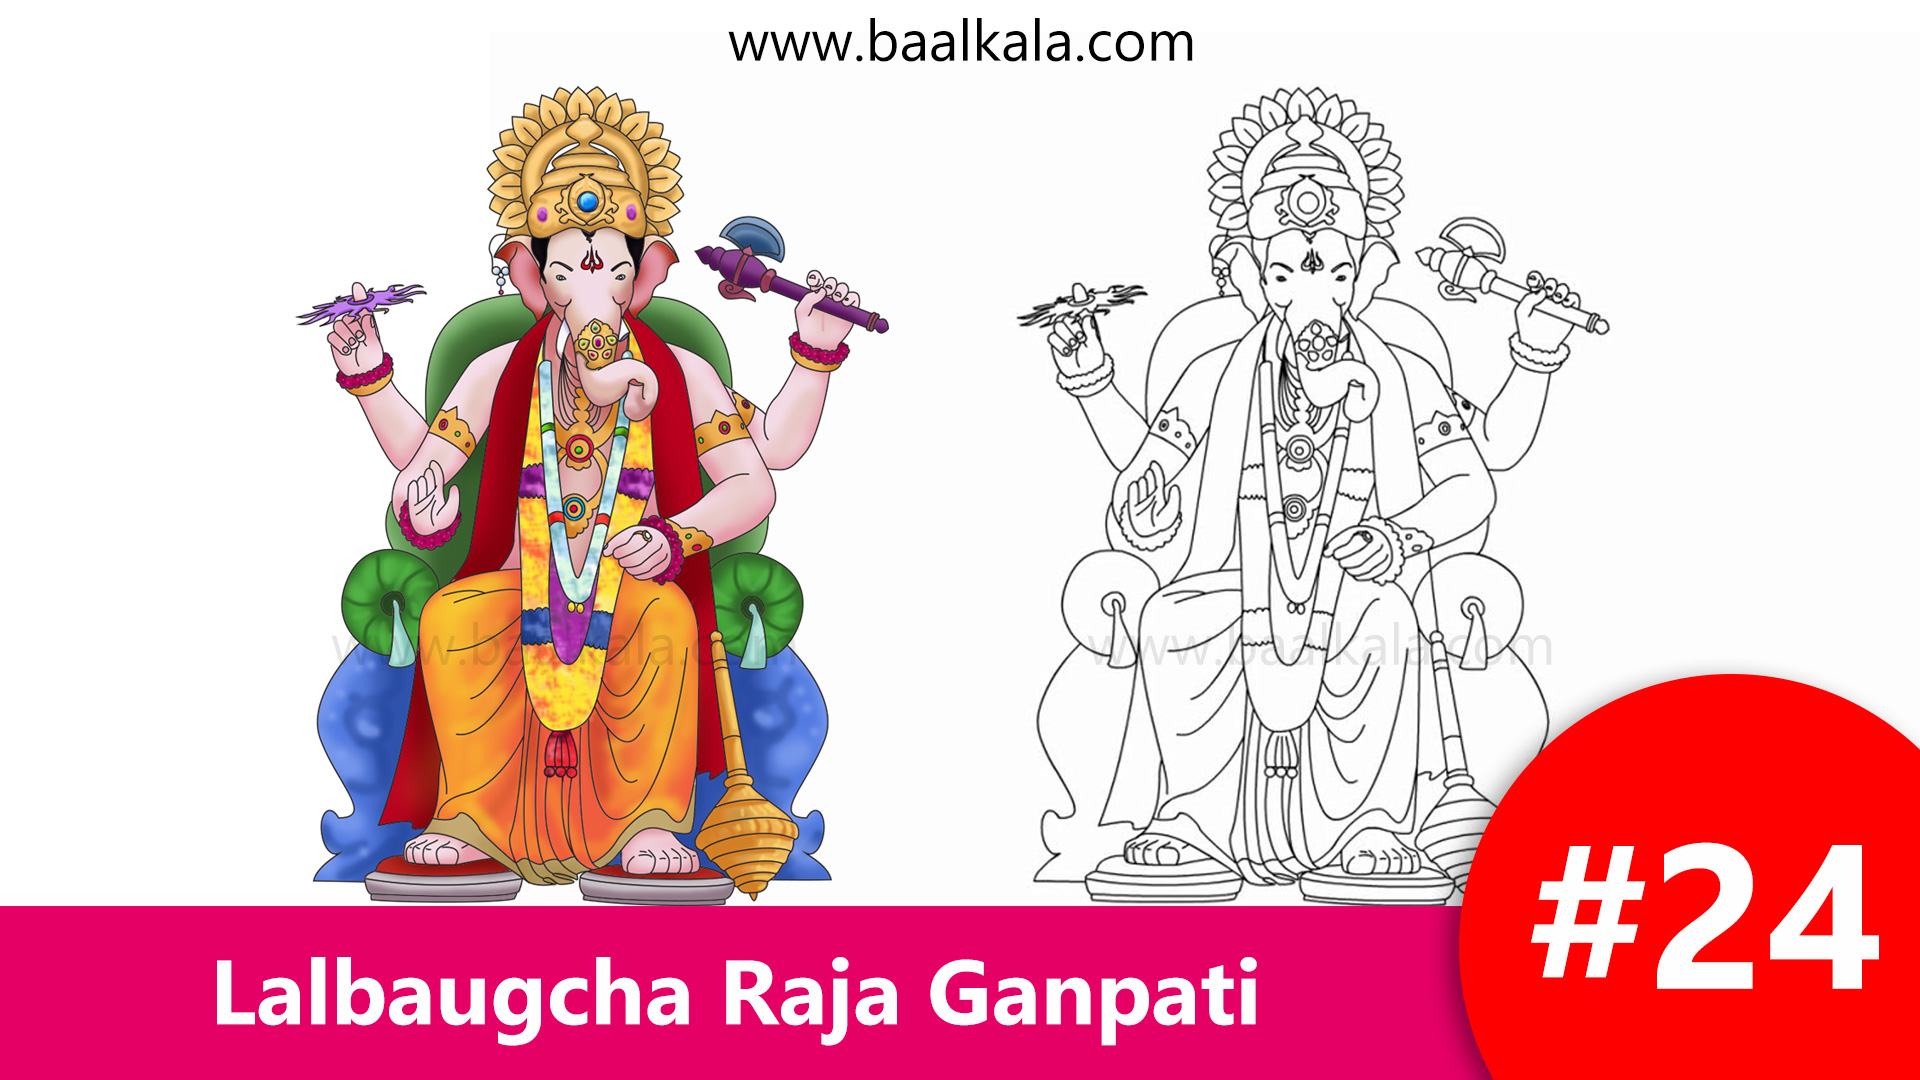 How To Draw Full Lalbaugcha Raja Ganpati Ganesha Drawing Baalkala